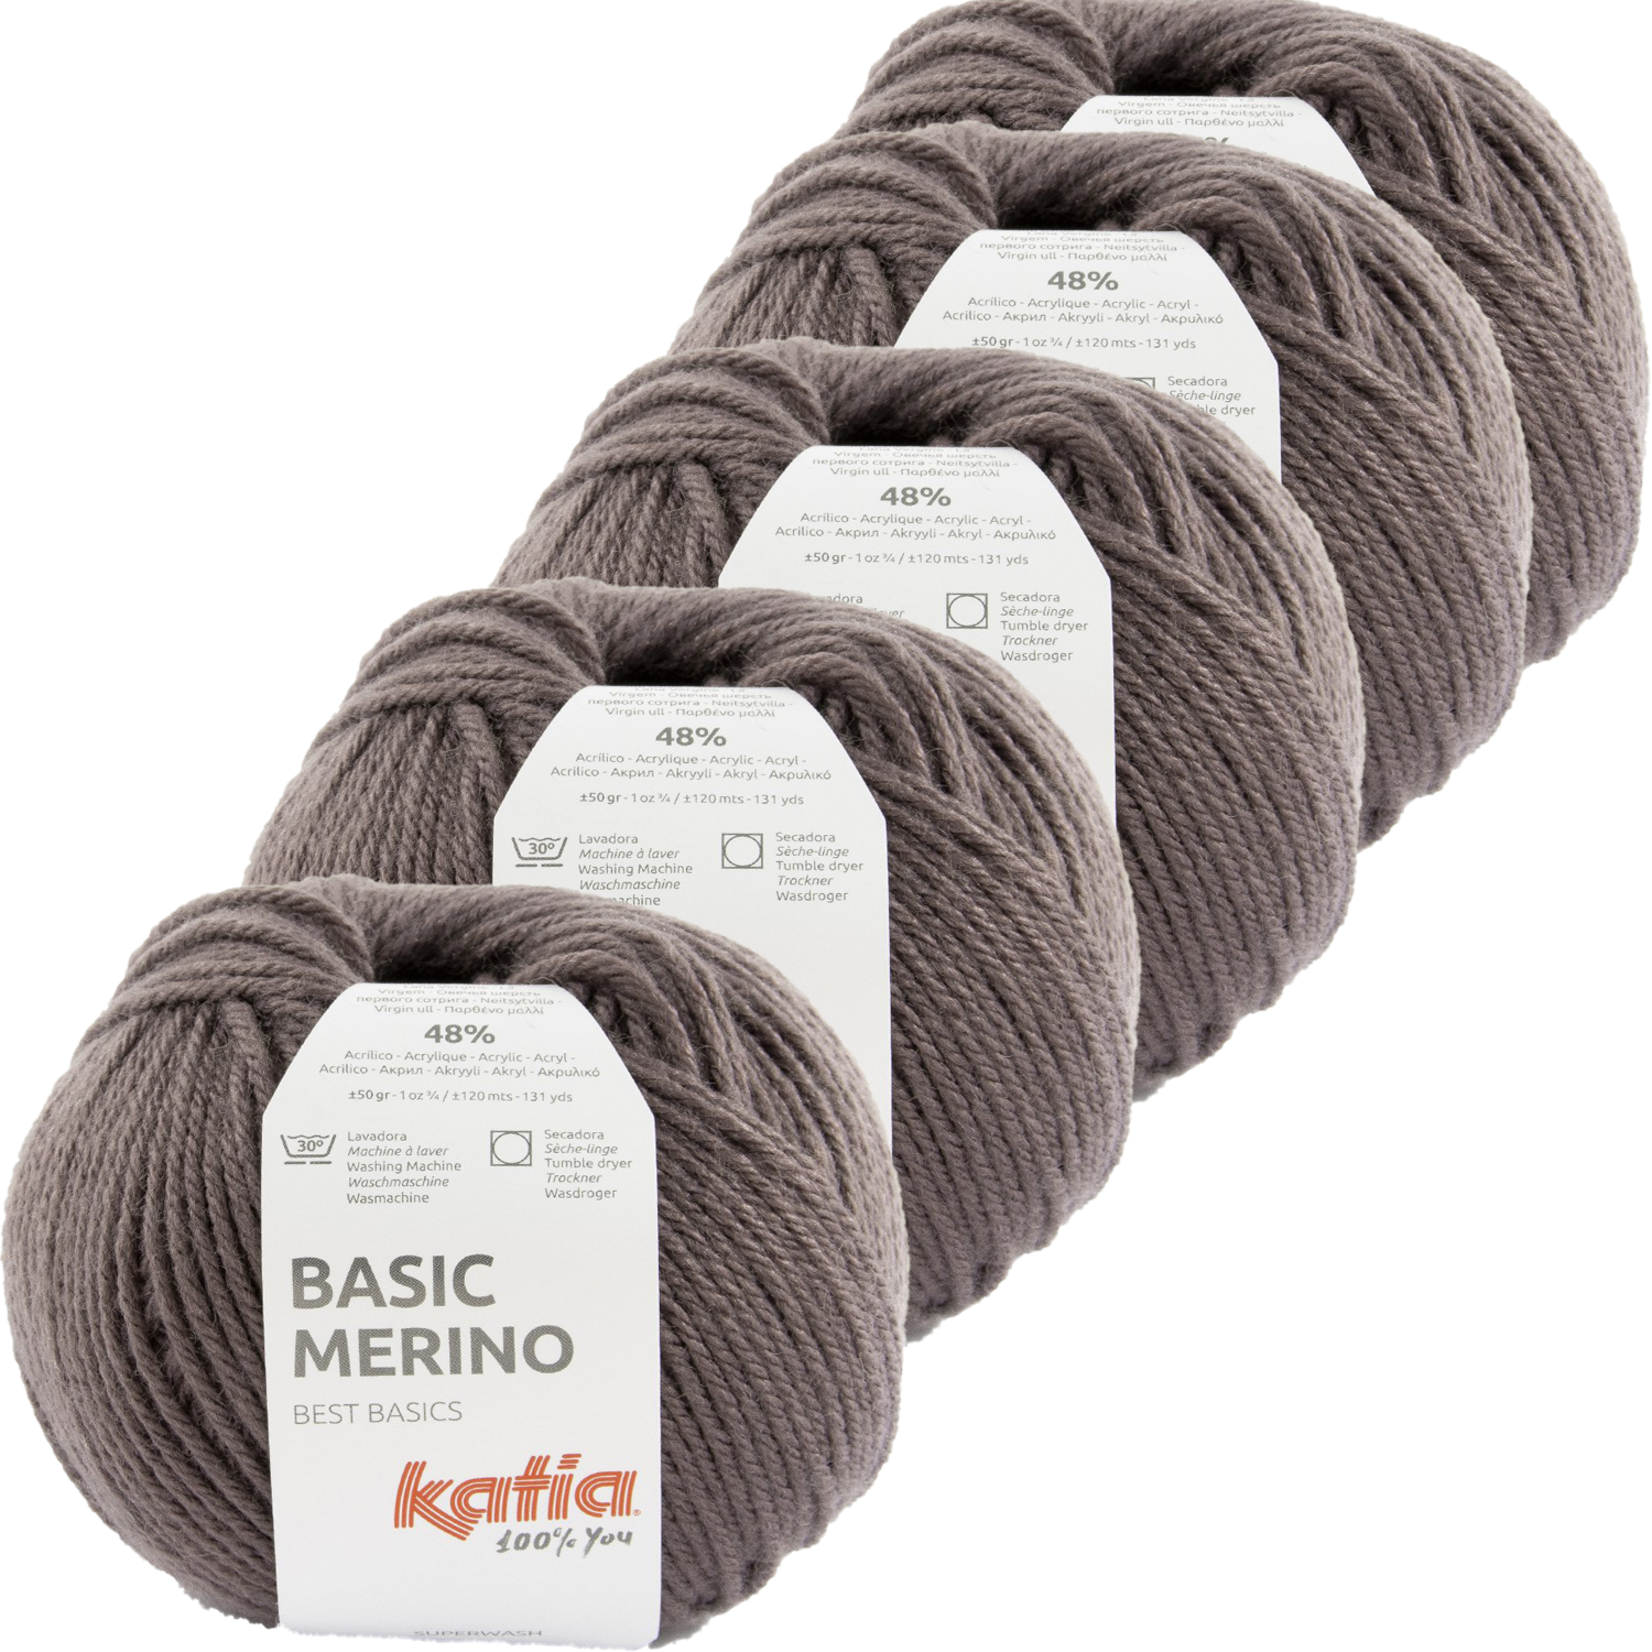 Katia Basic Merino - kleur 89_Aubergine - bundel 5 bollen 50 gr.  van 120 m.